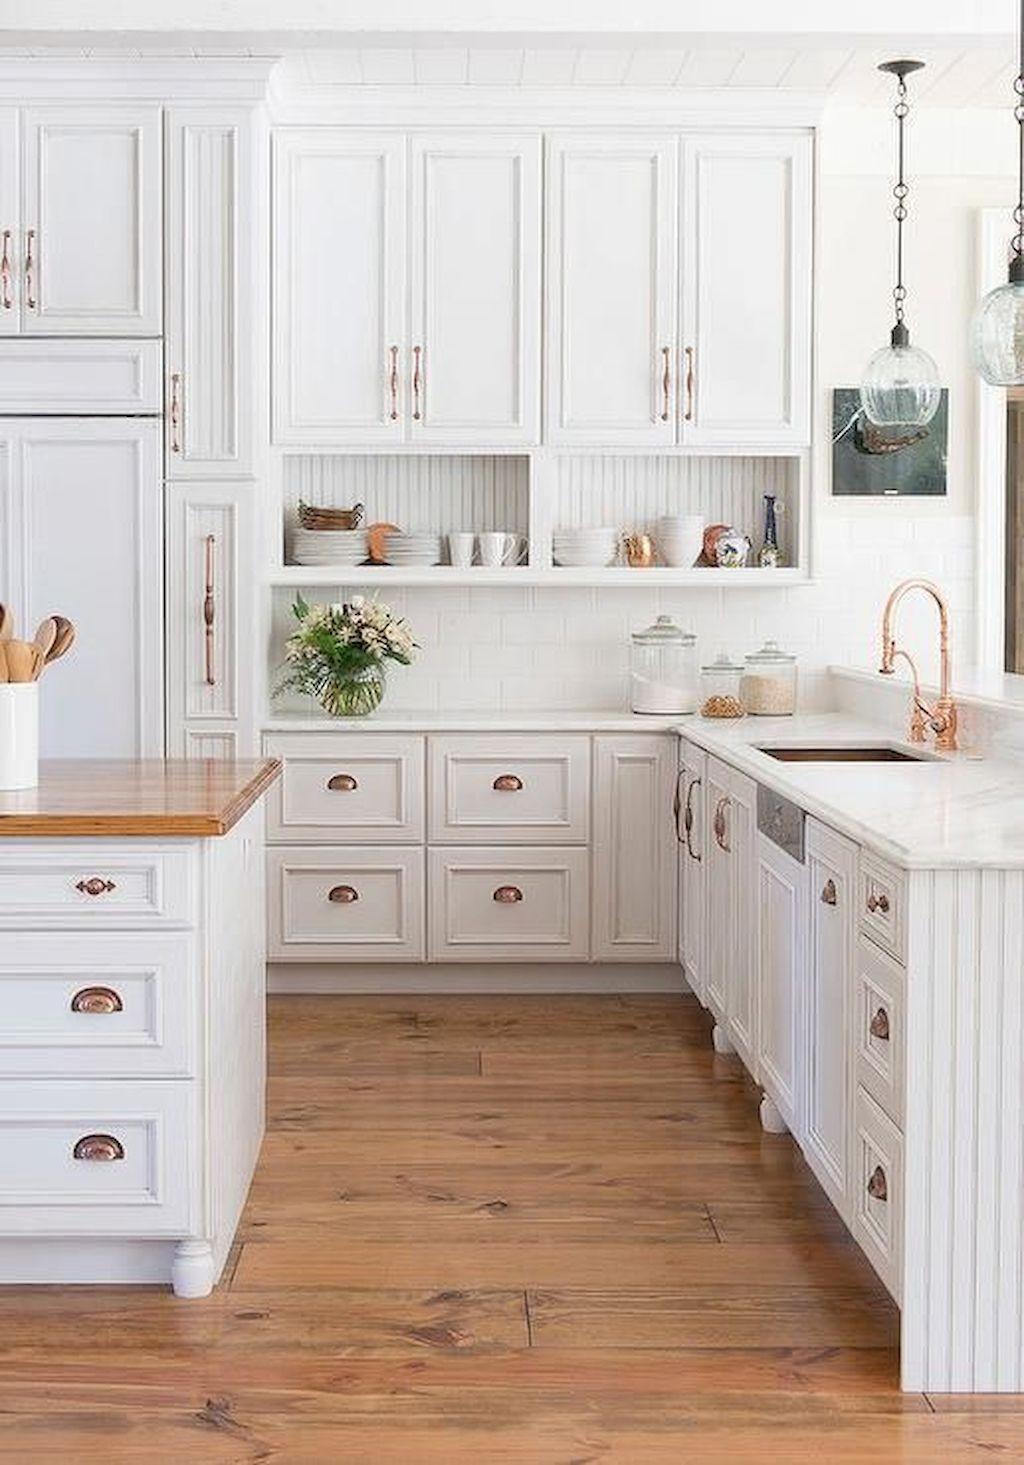 90 Elegant White Kitchen Cabinet Design Ideas Page 91 Of 91